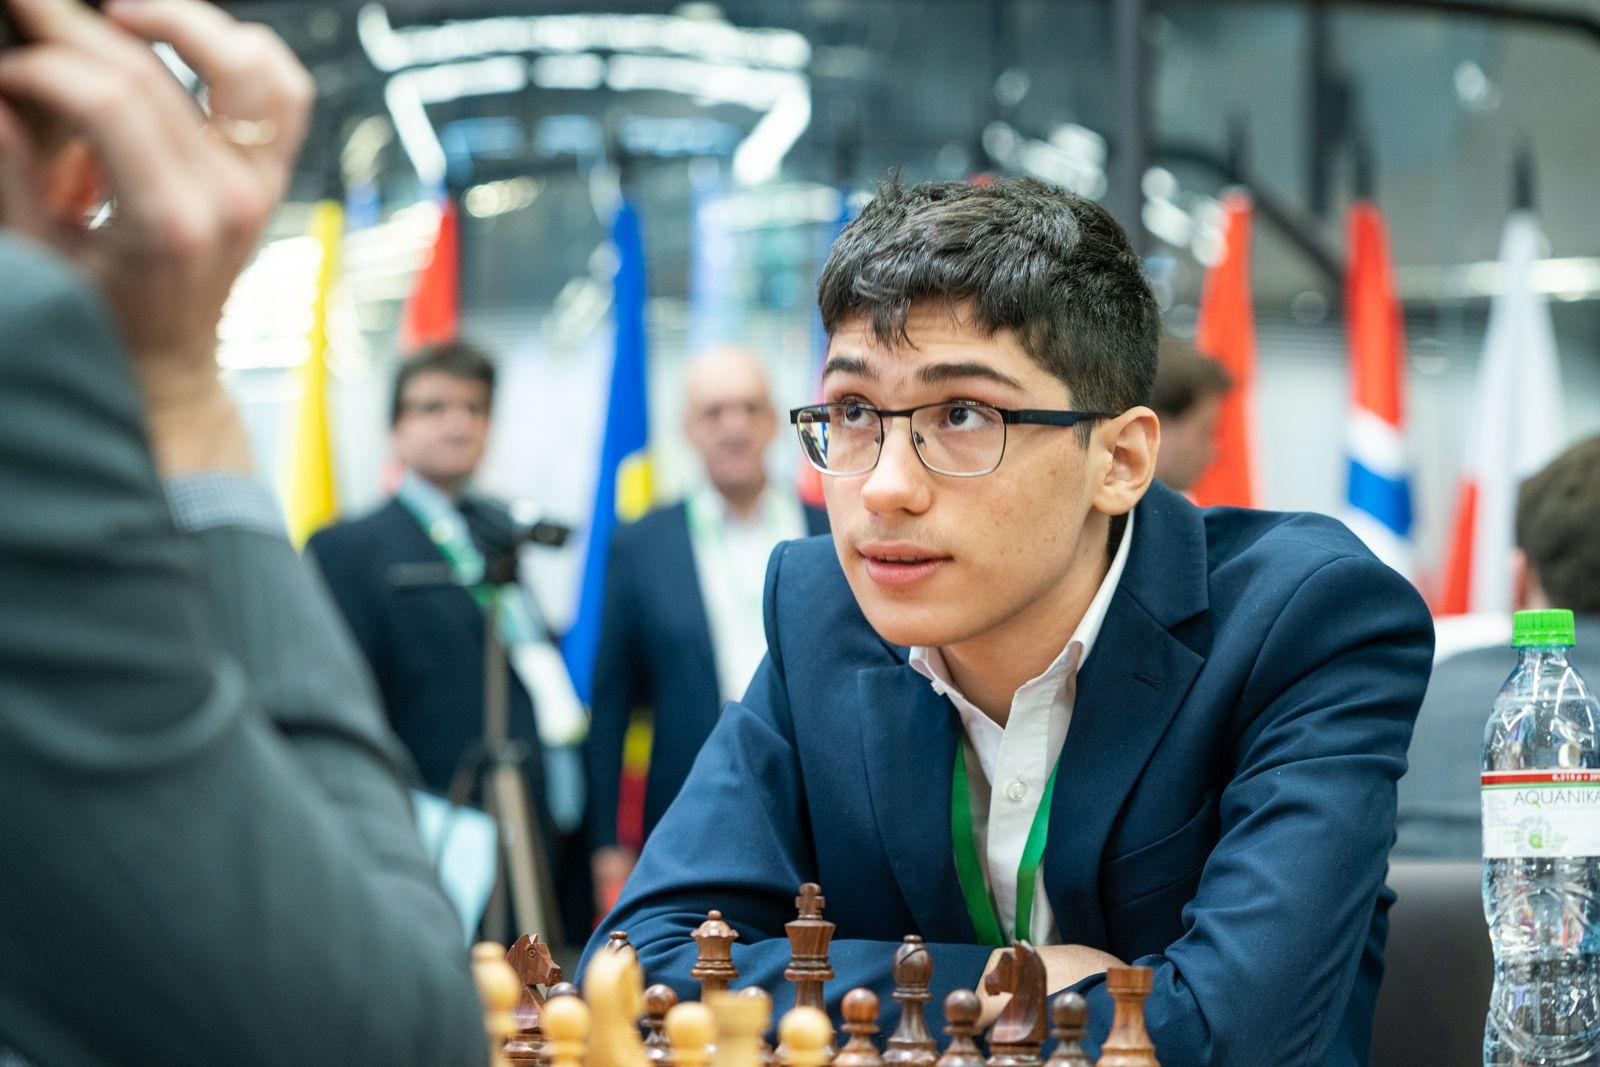 Alireza Firouzja silver 2021 World Rapid Chess Championship